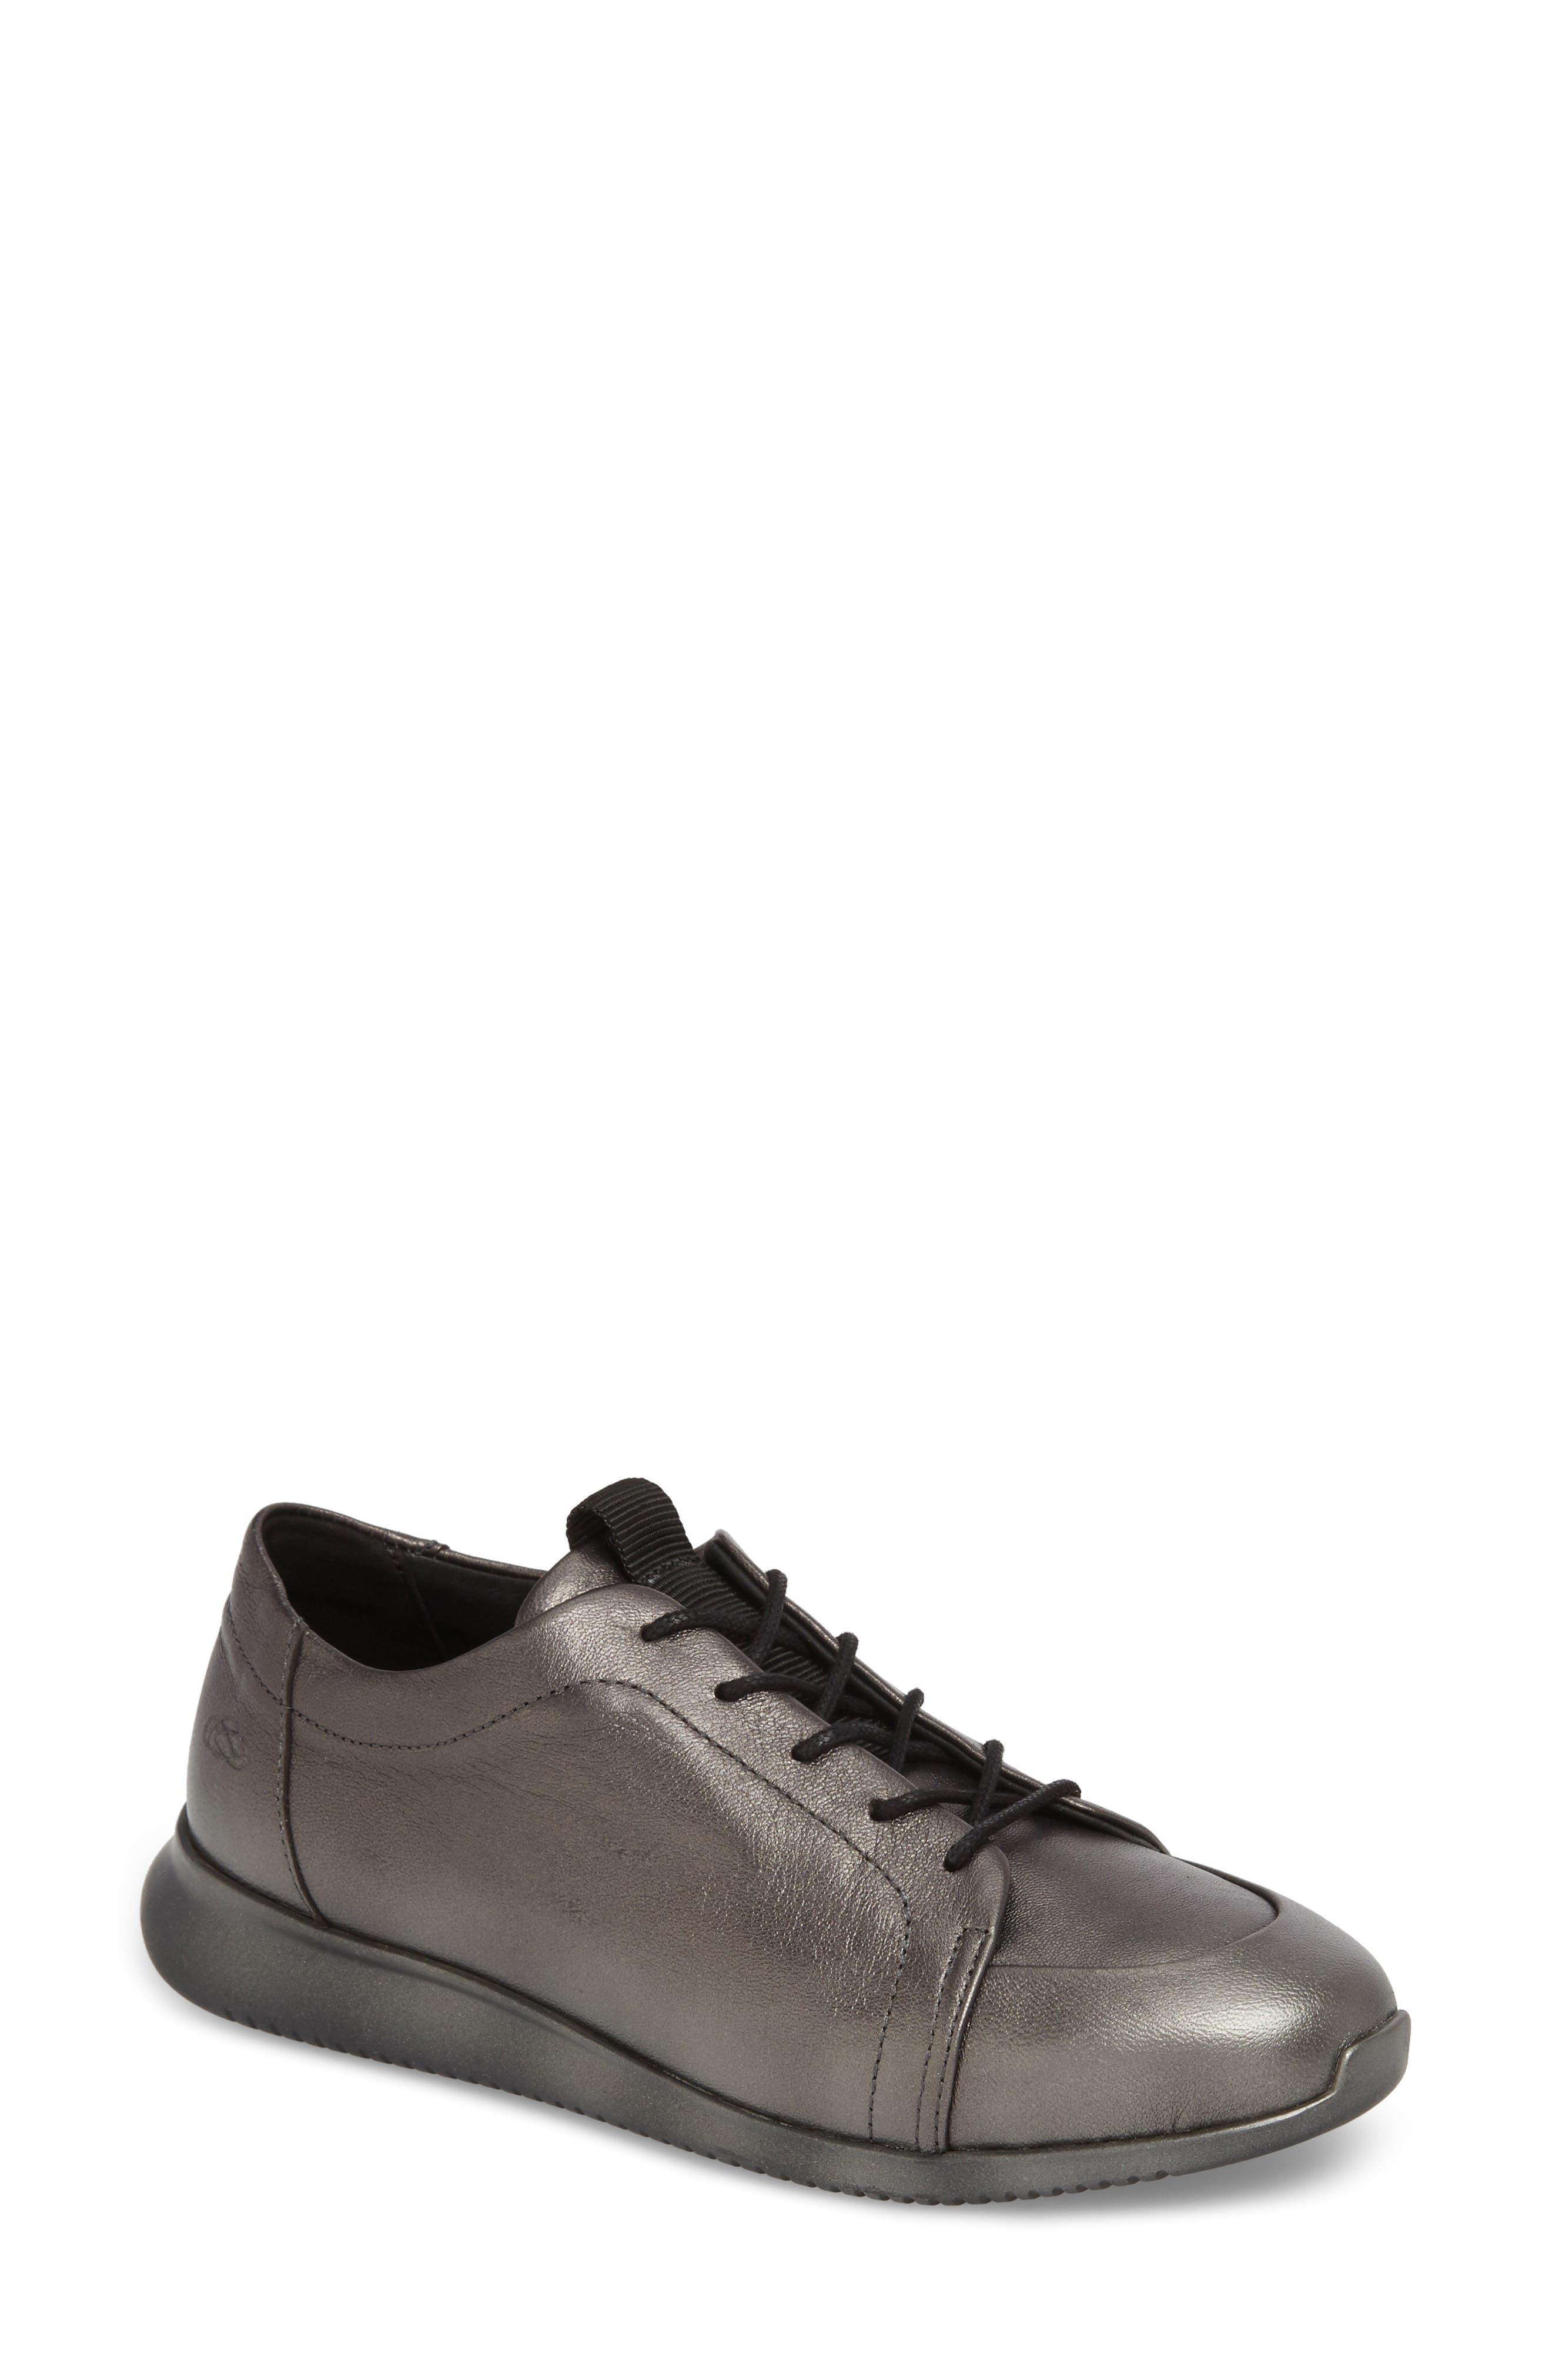 Ria Sneaker,                             Main thumbnail 1, color,                             Pirita Leather